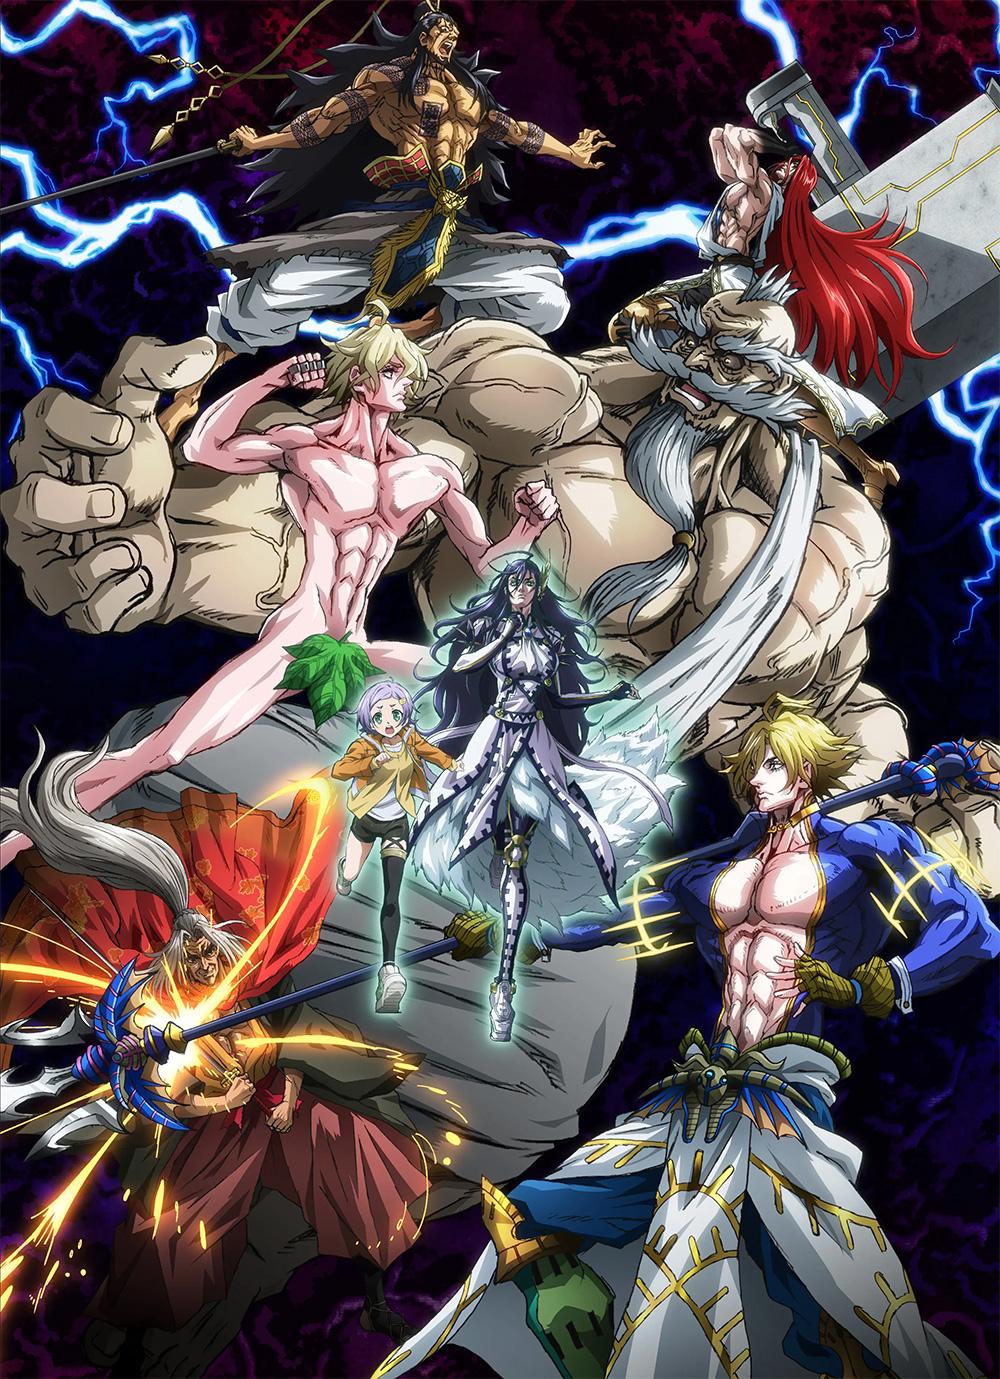 Record-of-Ragnarok-Anime-Visual-02